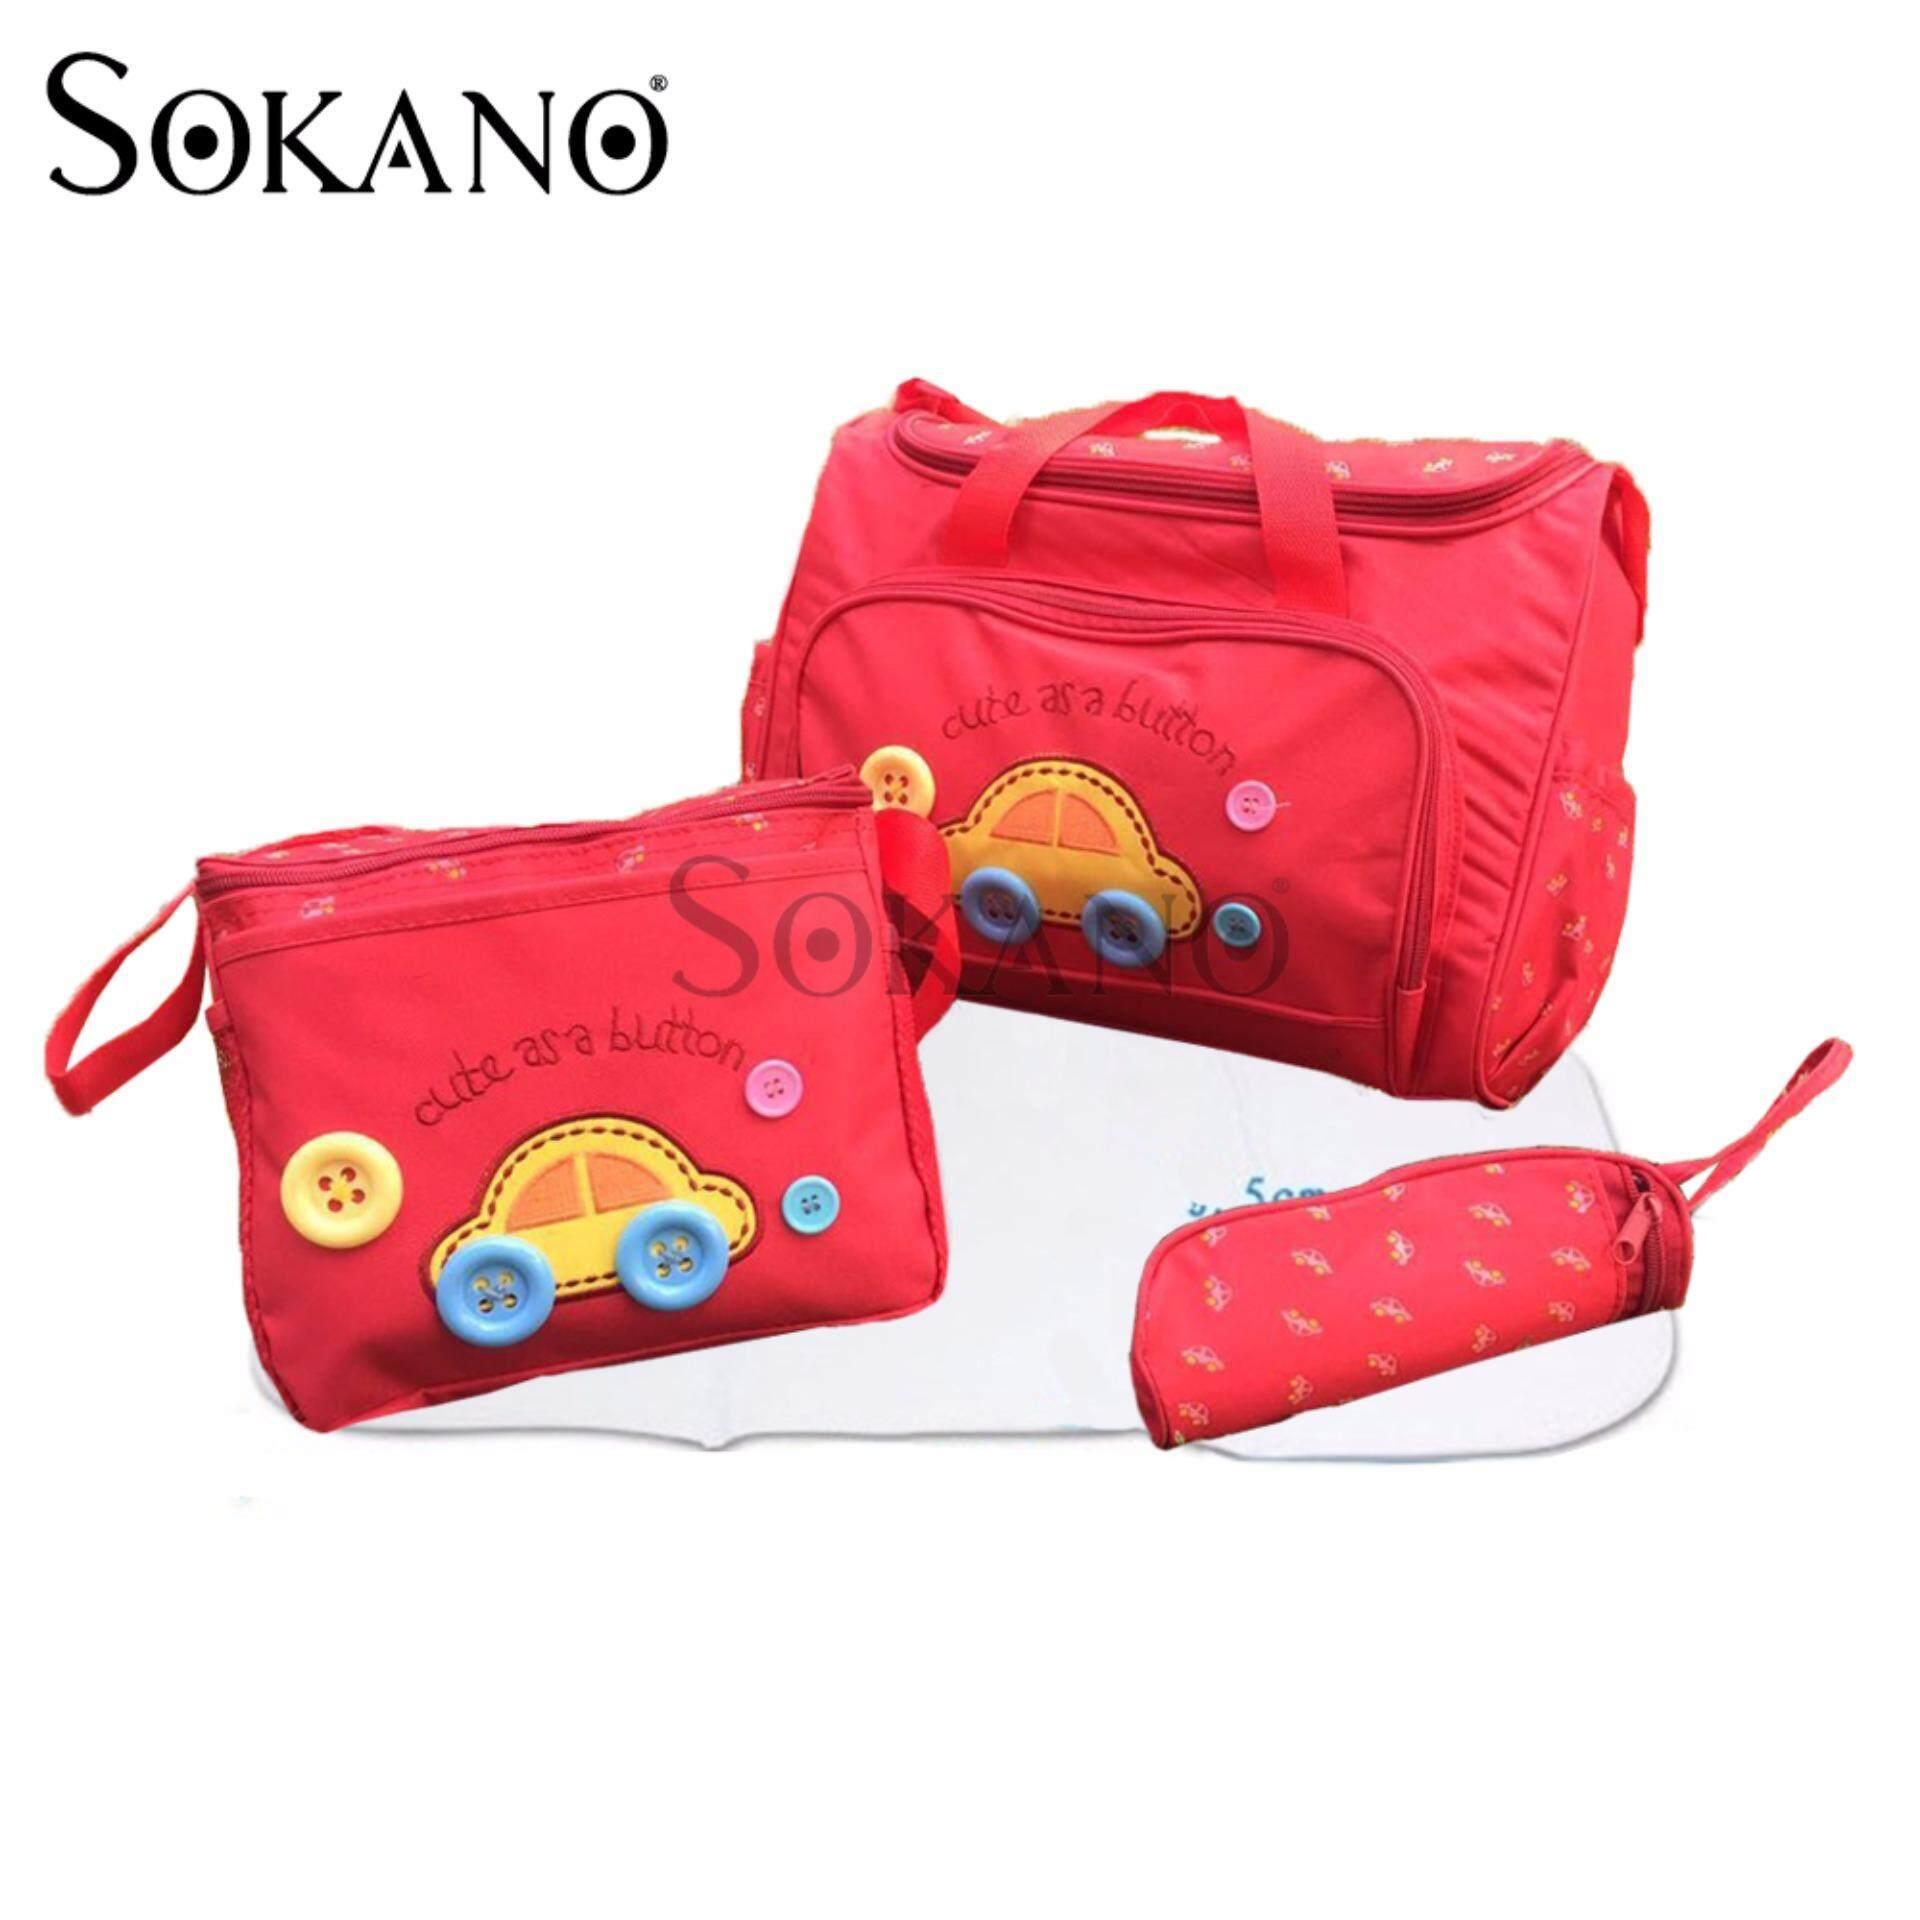 SOKANO Premium Cutie Large Capacity Diaper Bag 4 pcs Set- Red